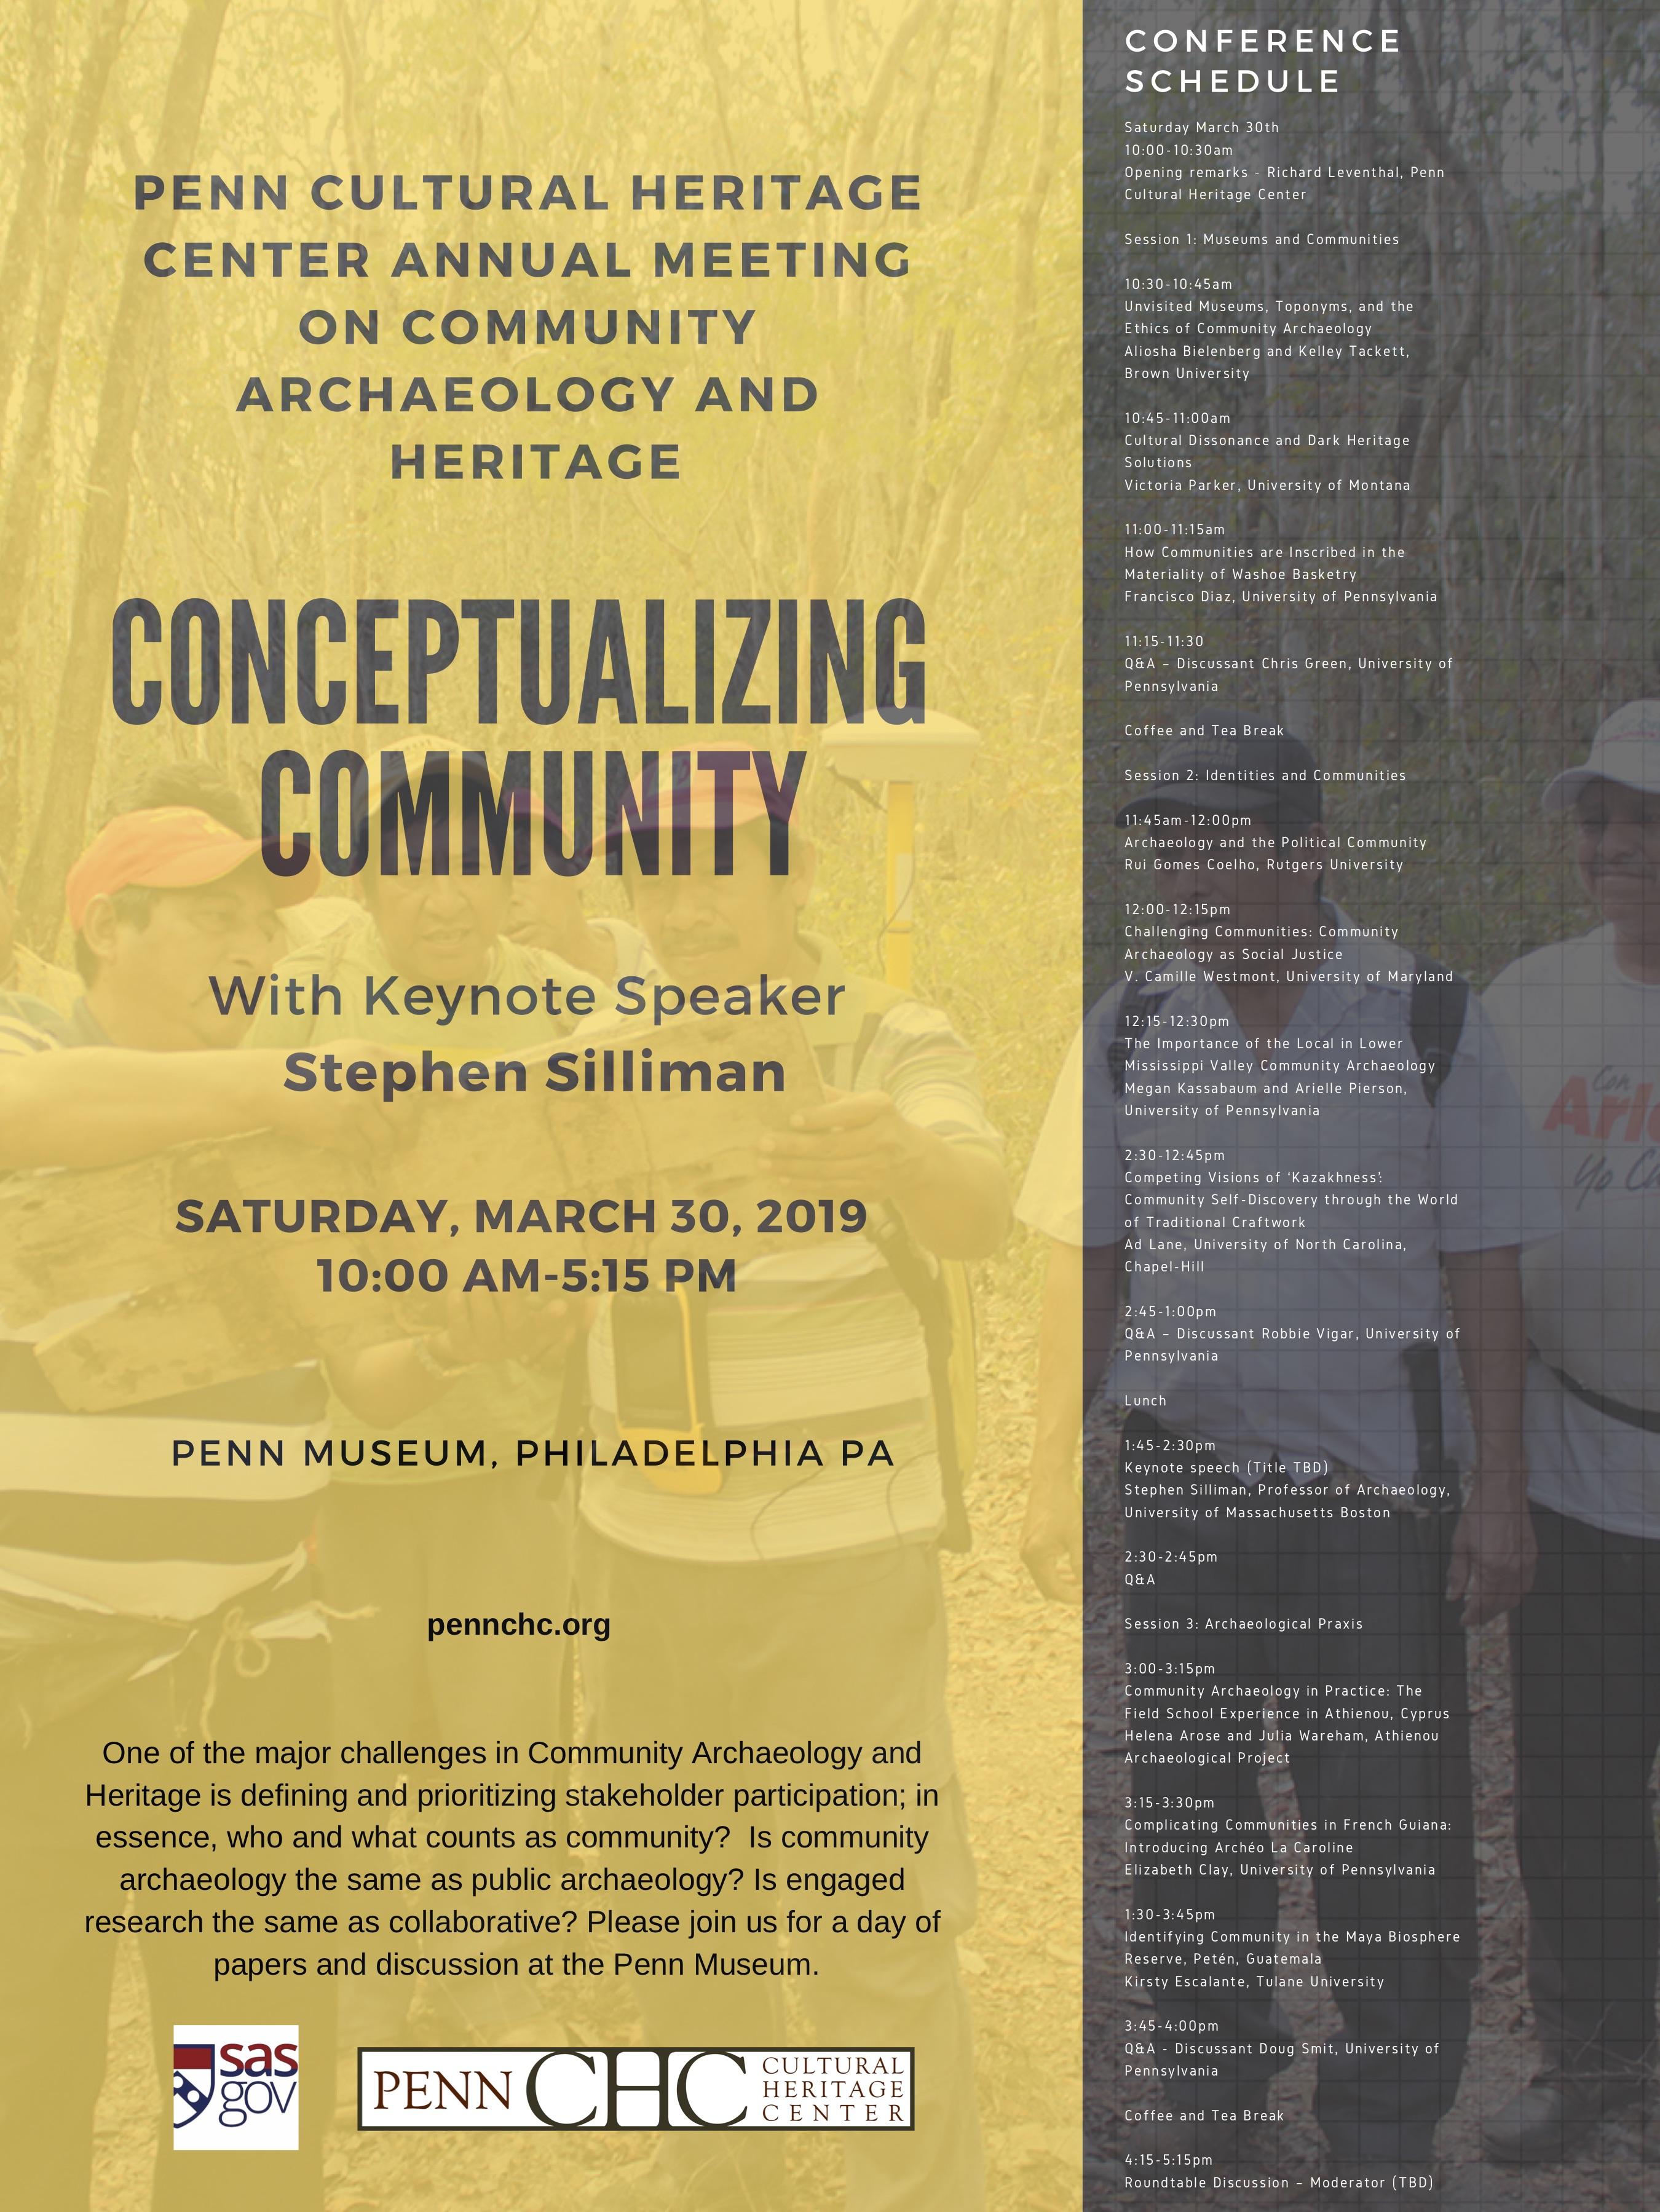 Penn Cultural Heritage Center | Conceptualizing Community